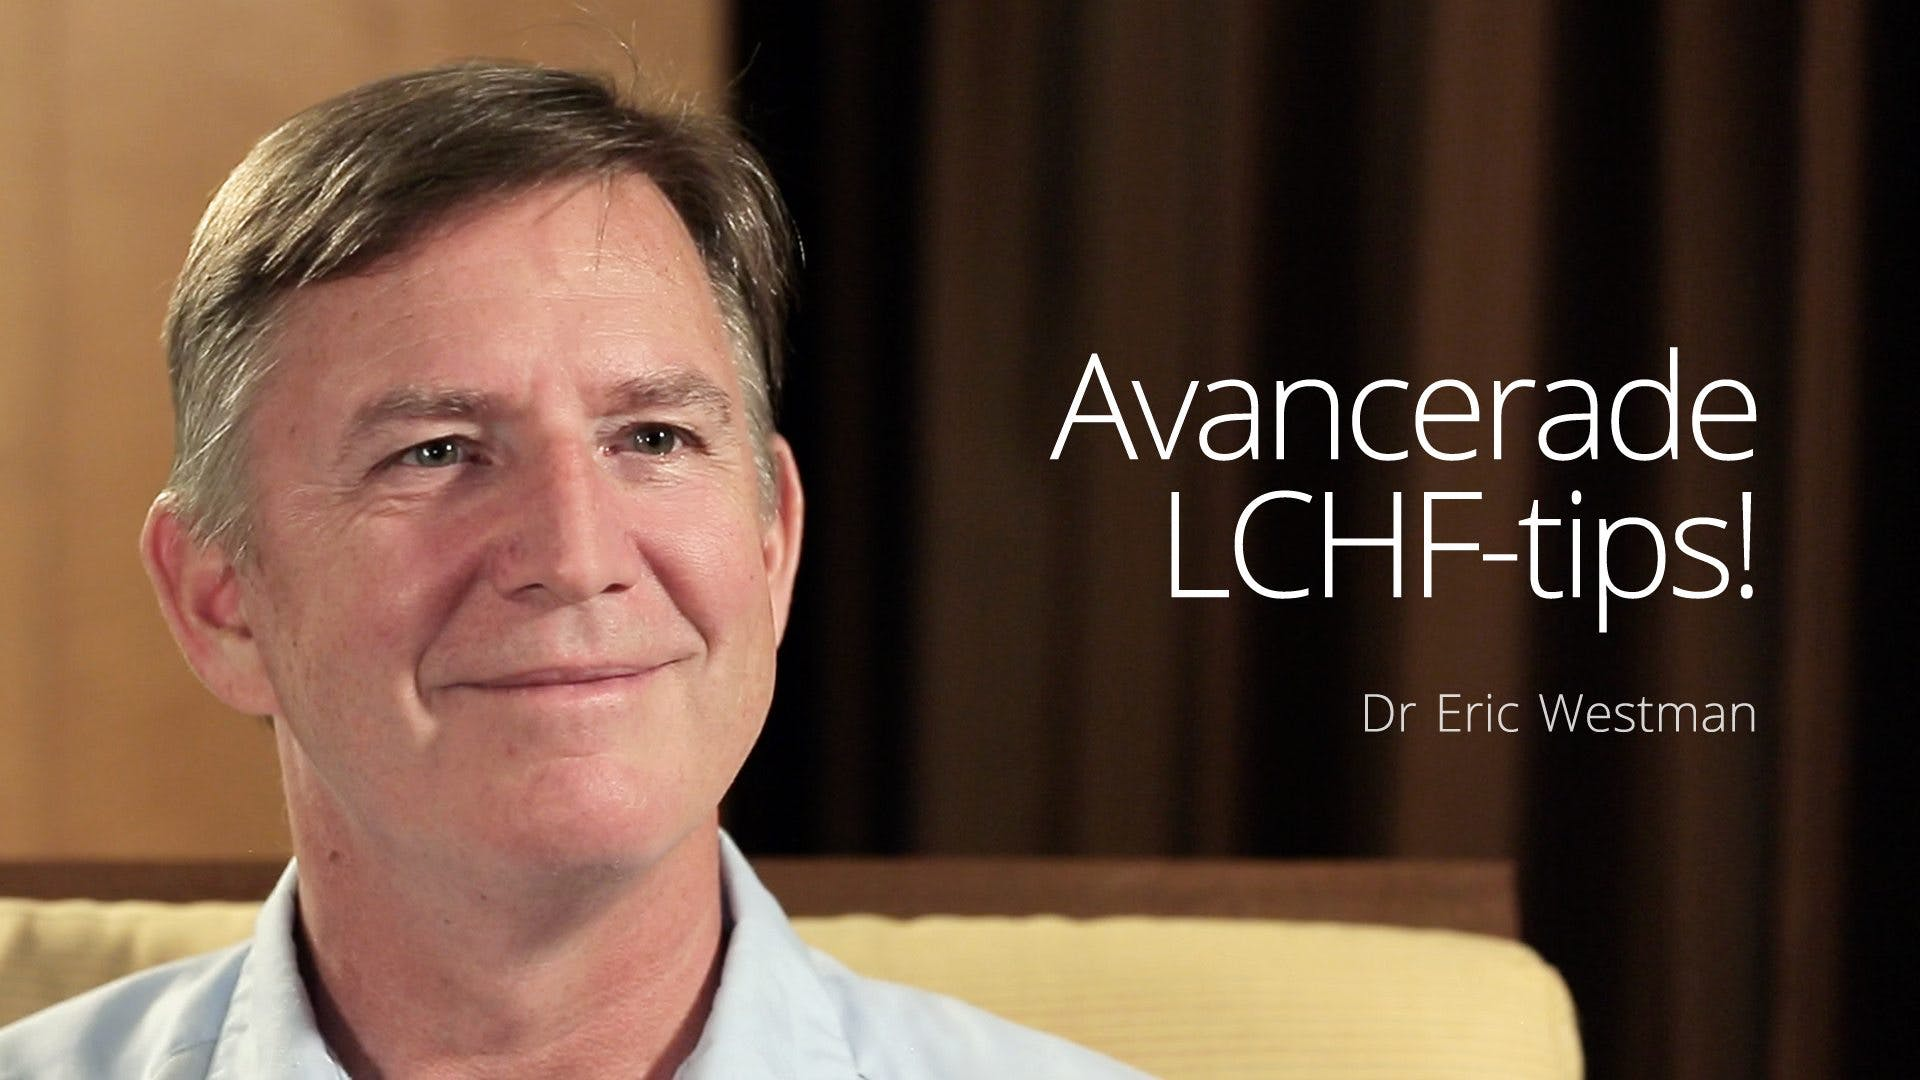 Avancerade LCHF-tips - dr Eric Westman